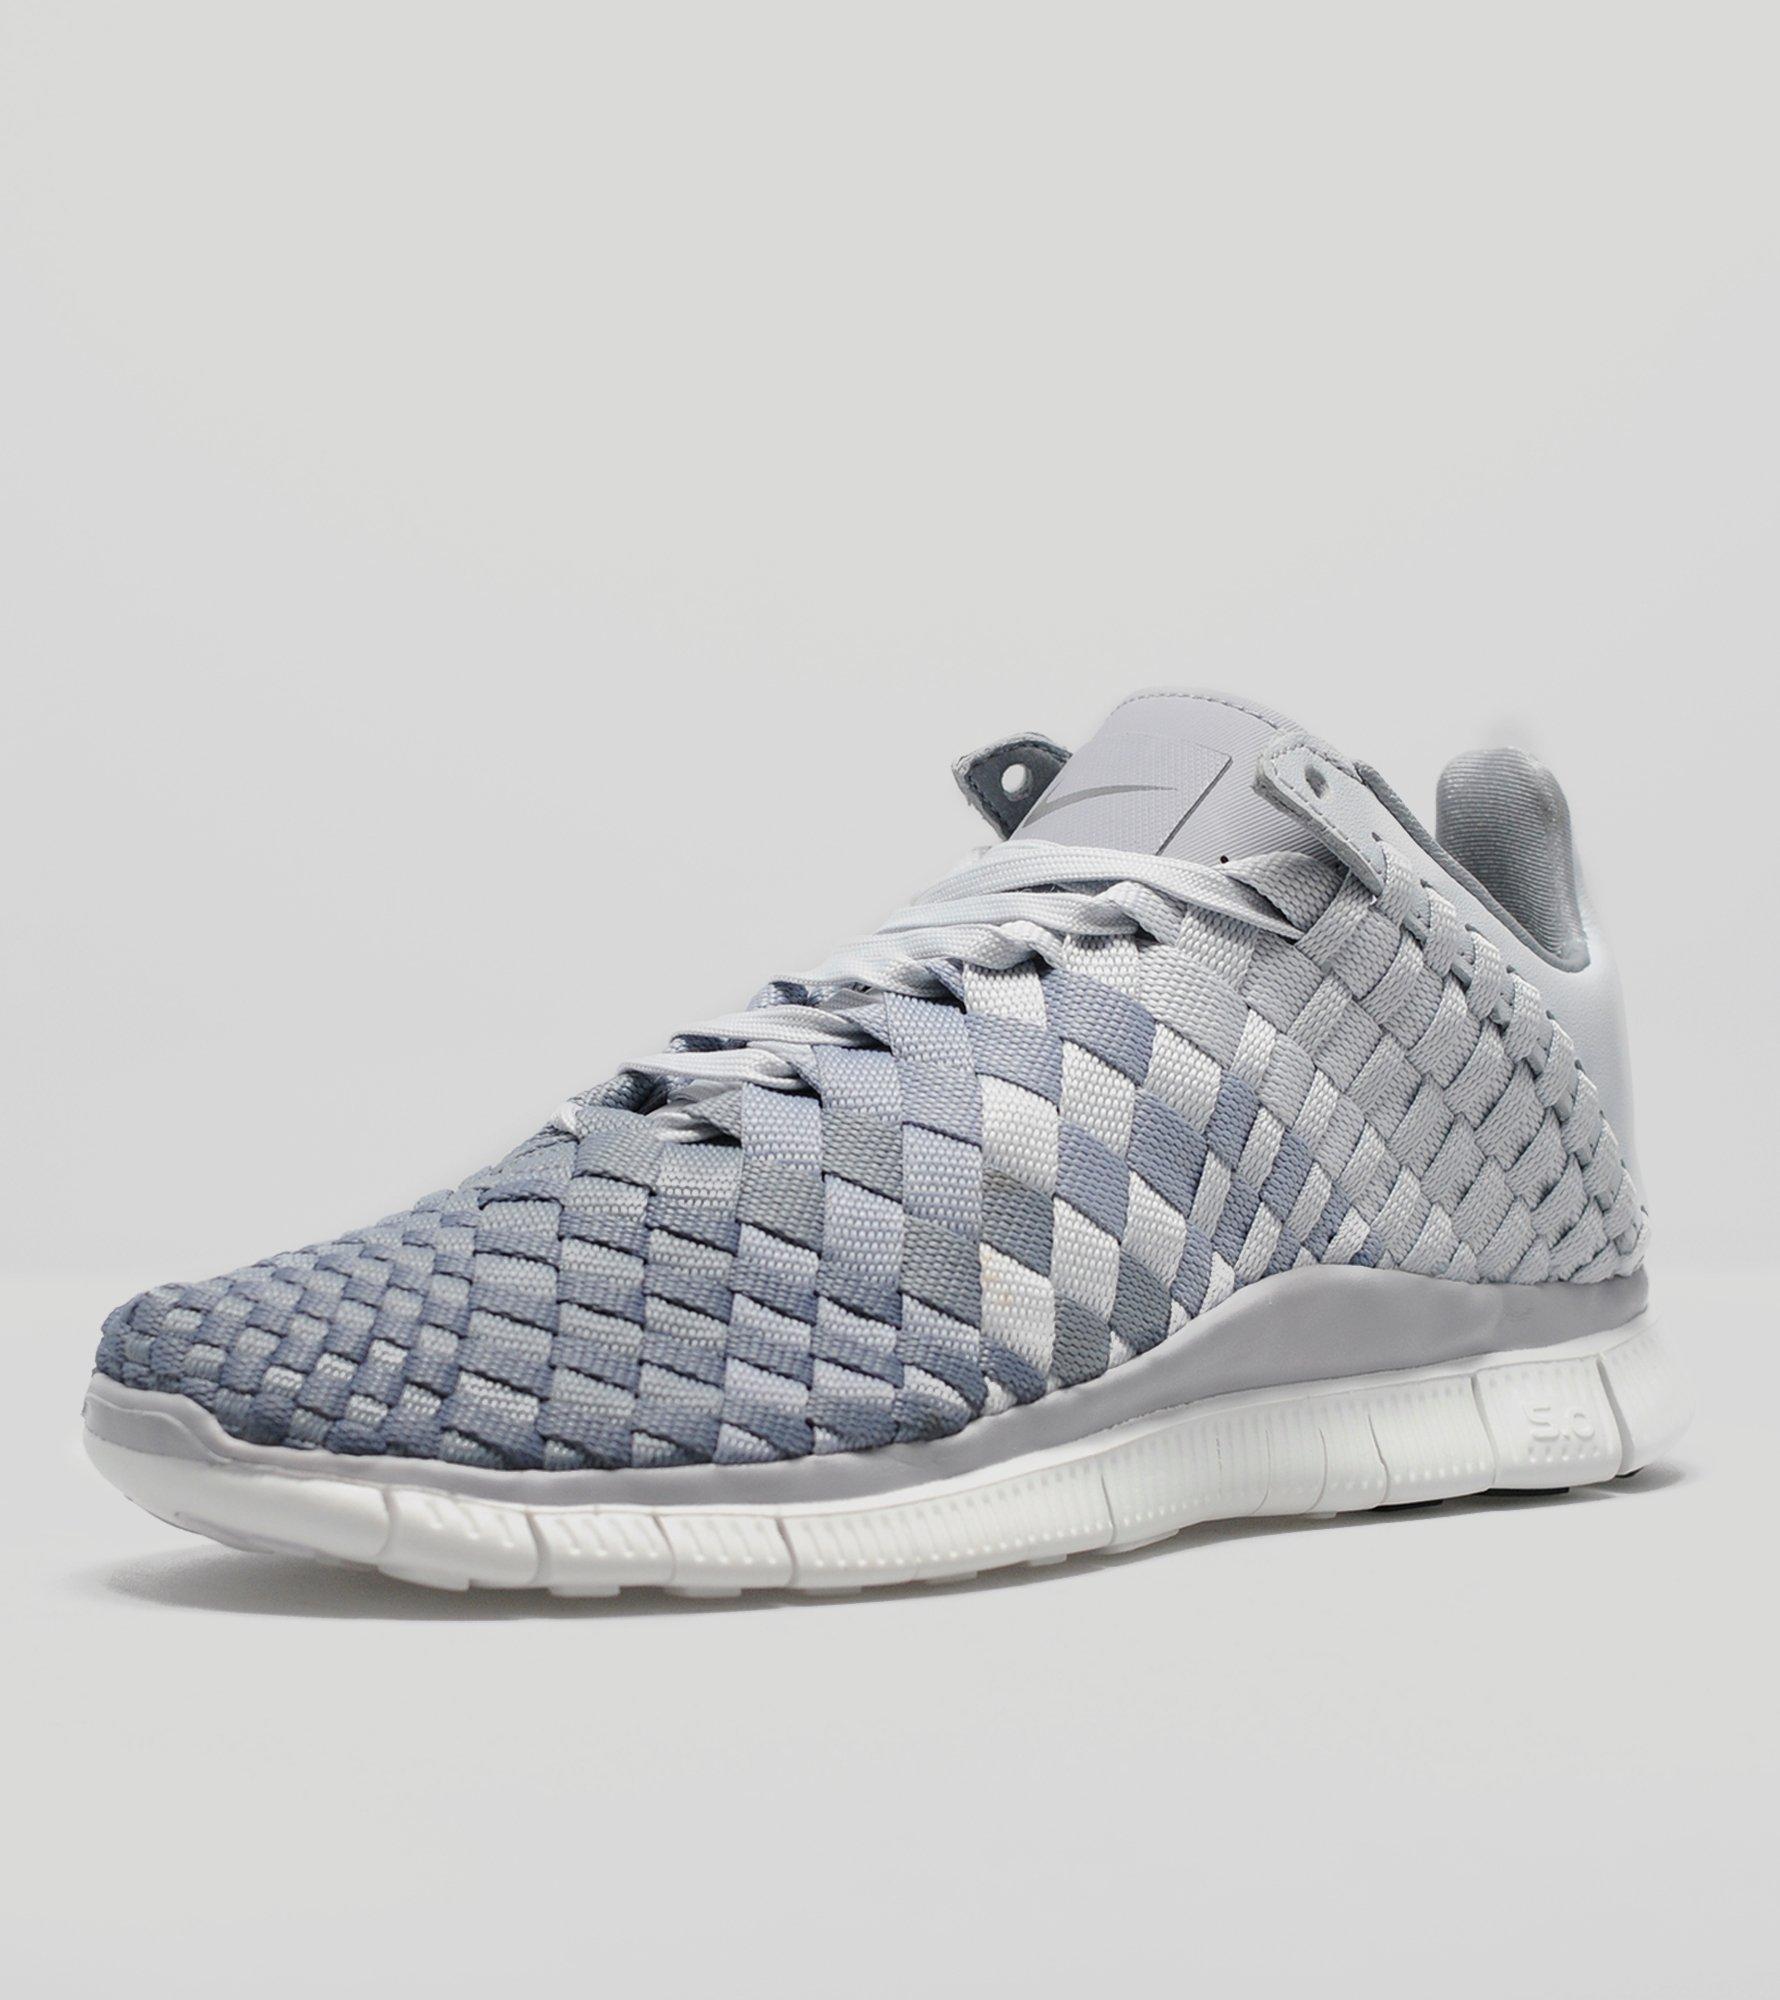 Nike Innova Sans Chaussures Habillées Travestissement Blanc Tissé